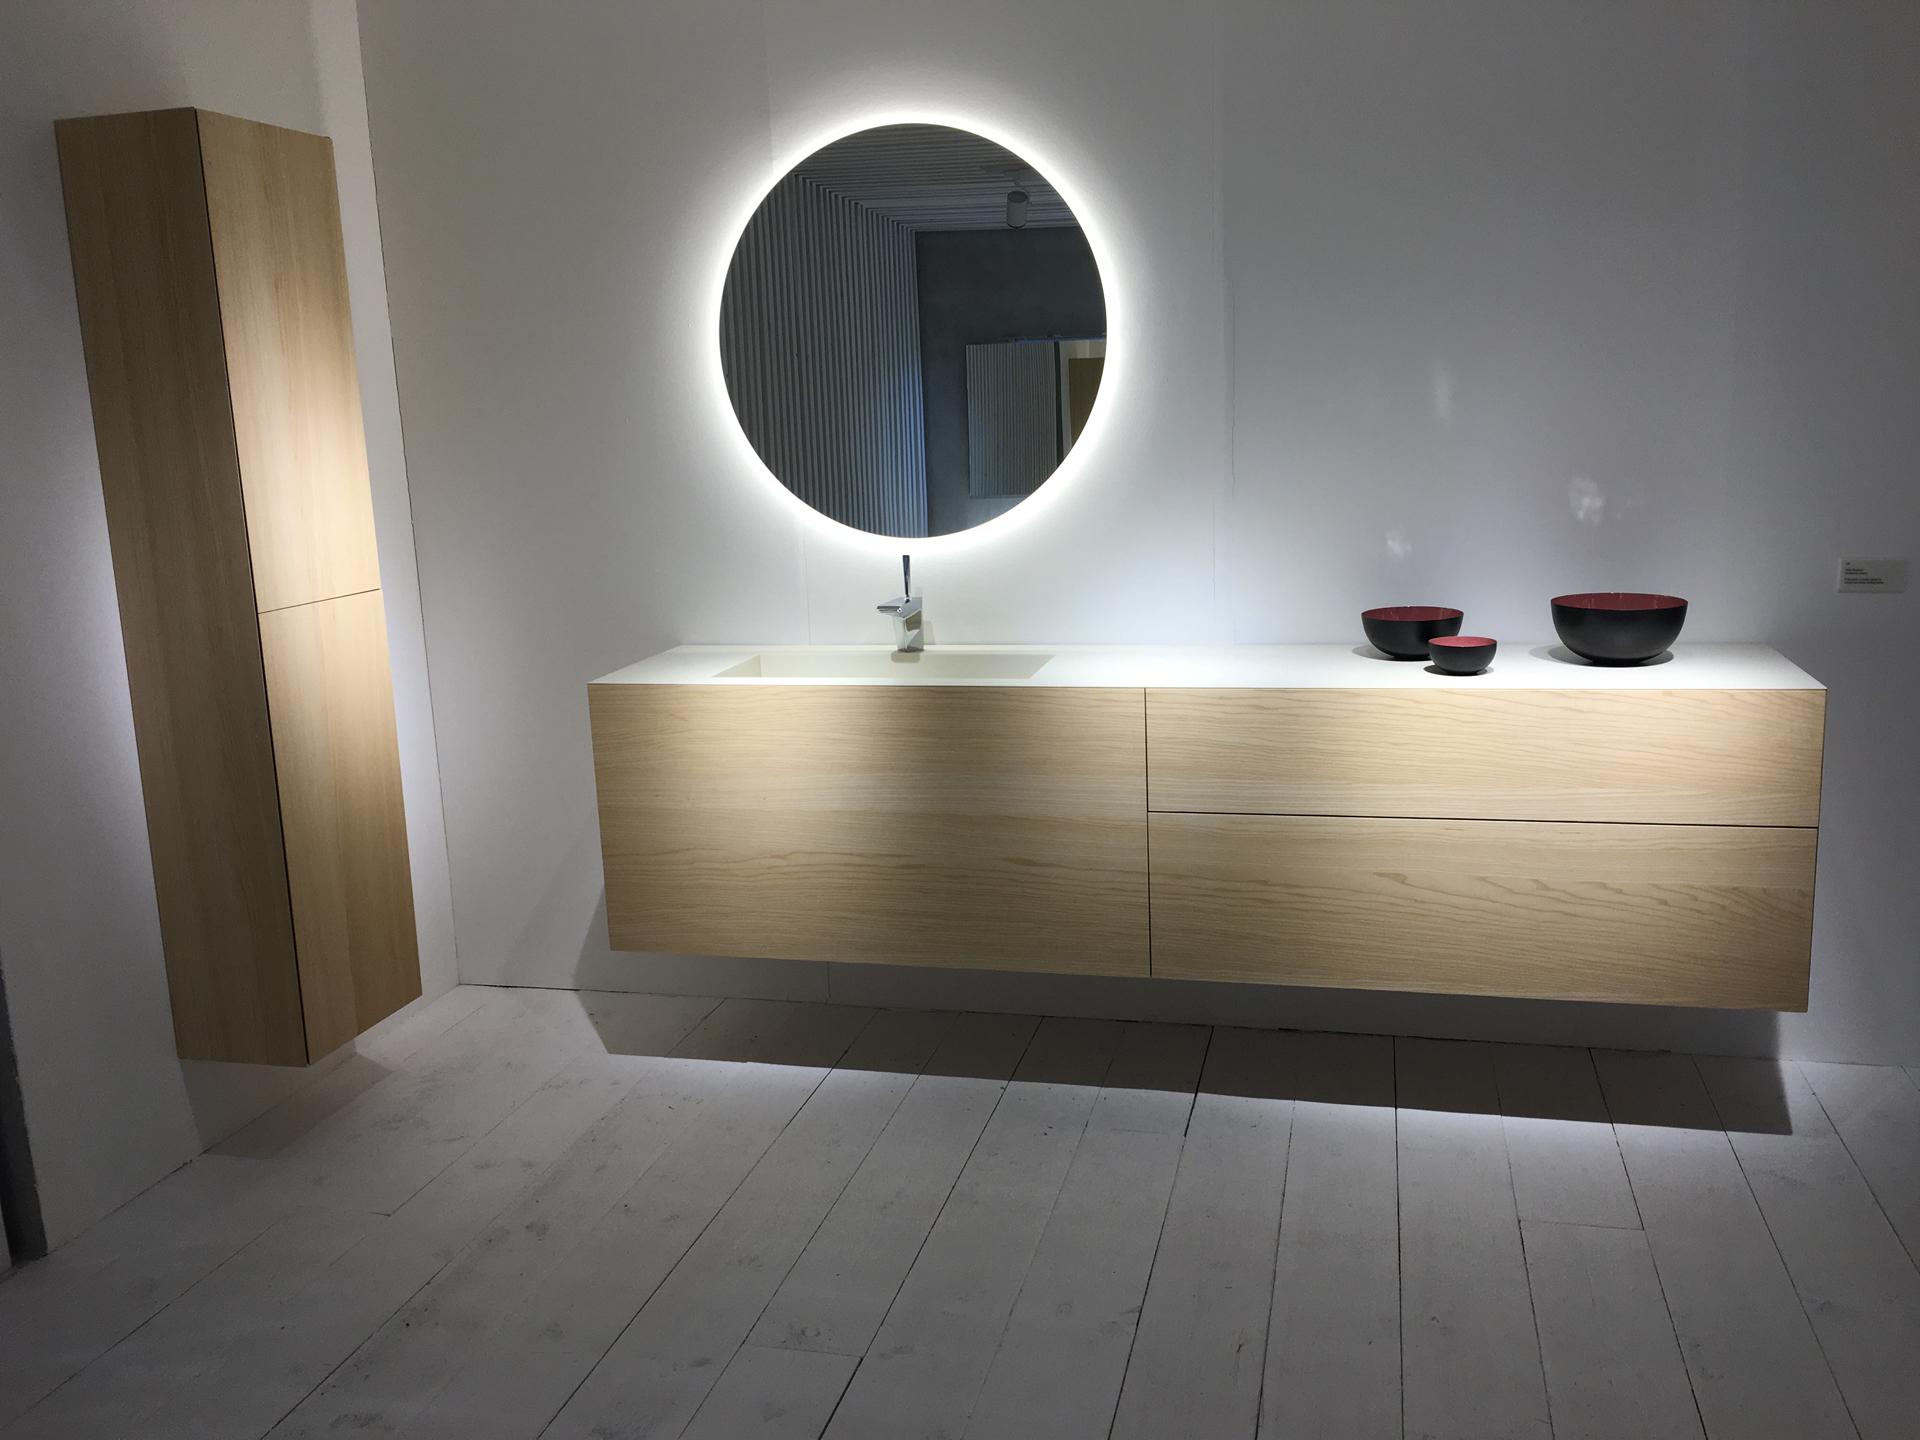 feria-cevisama-valencia-2018-decoracion-interiorismo-7